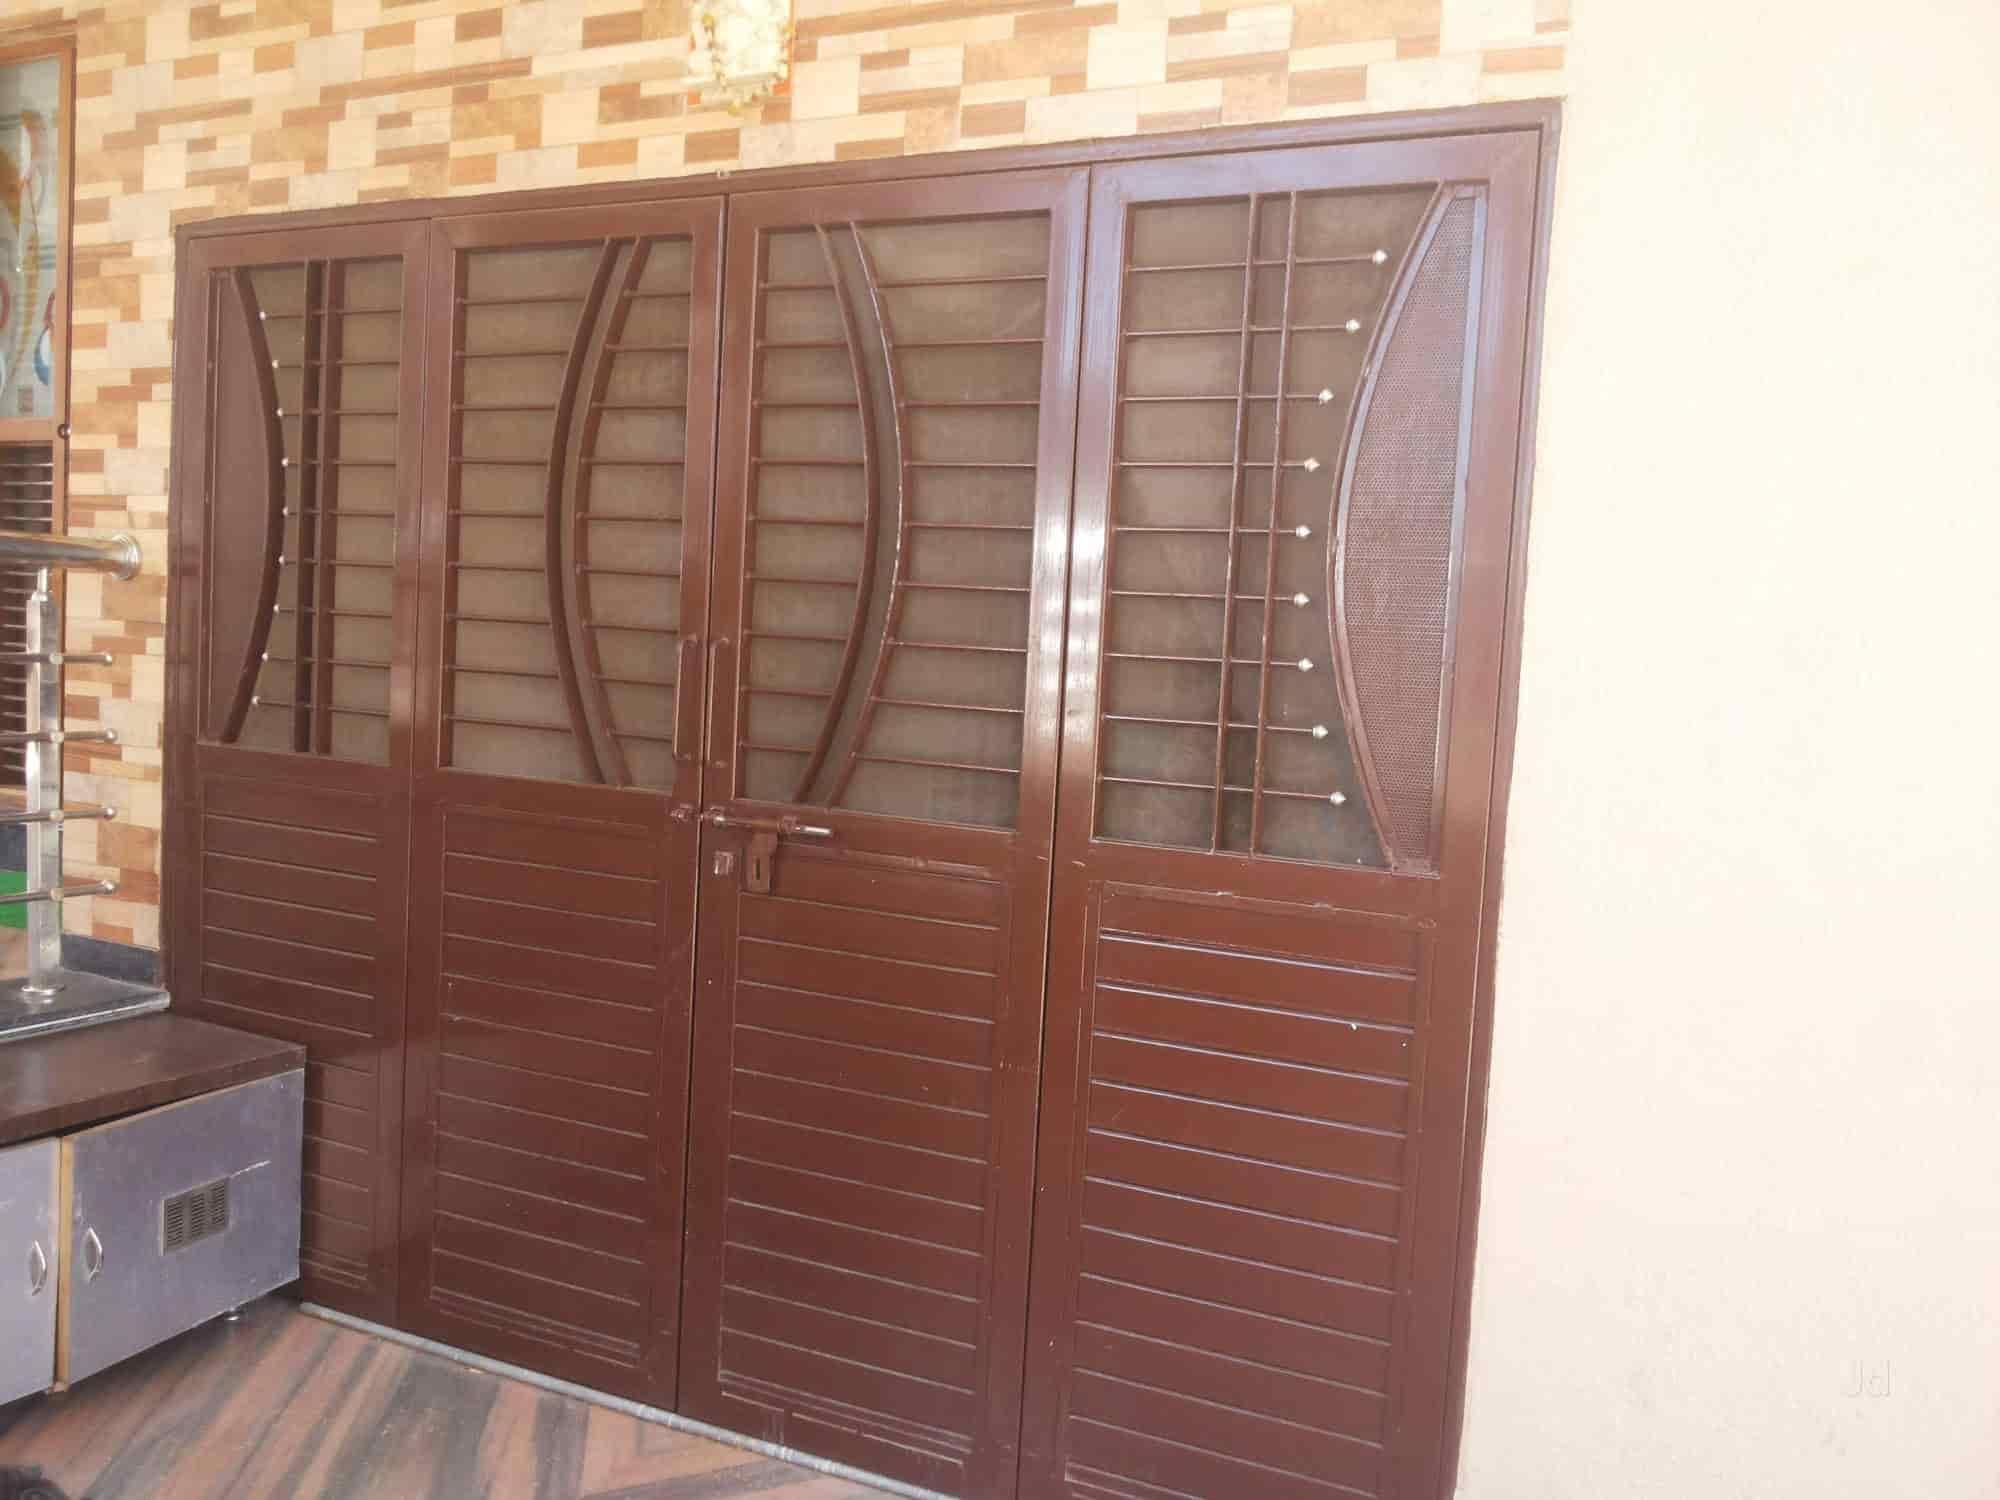 ... Fabrication Works For Door   Nashik Trading Company Photos, Dwarka,  Nashik   Fabricators ...